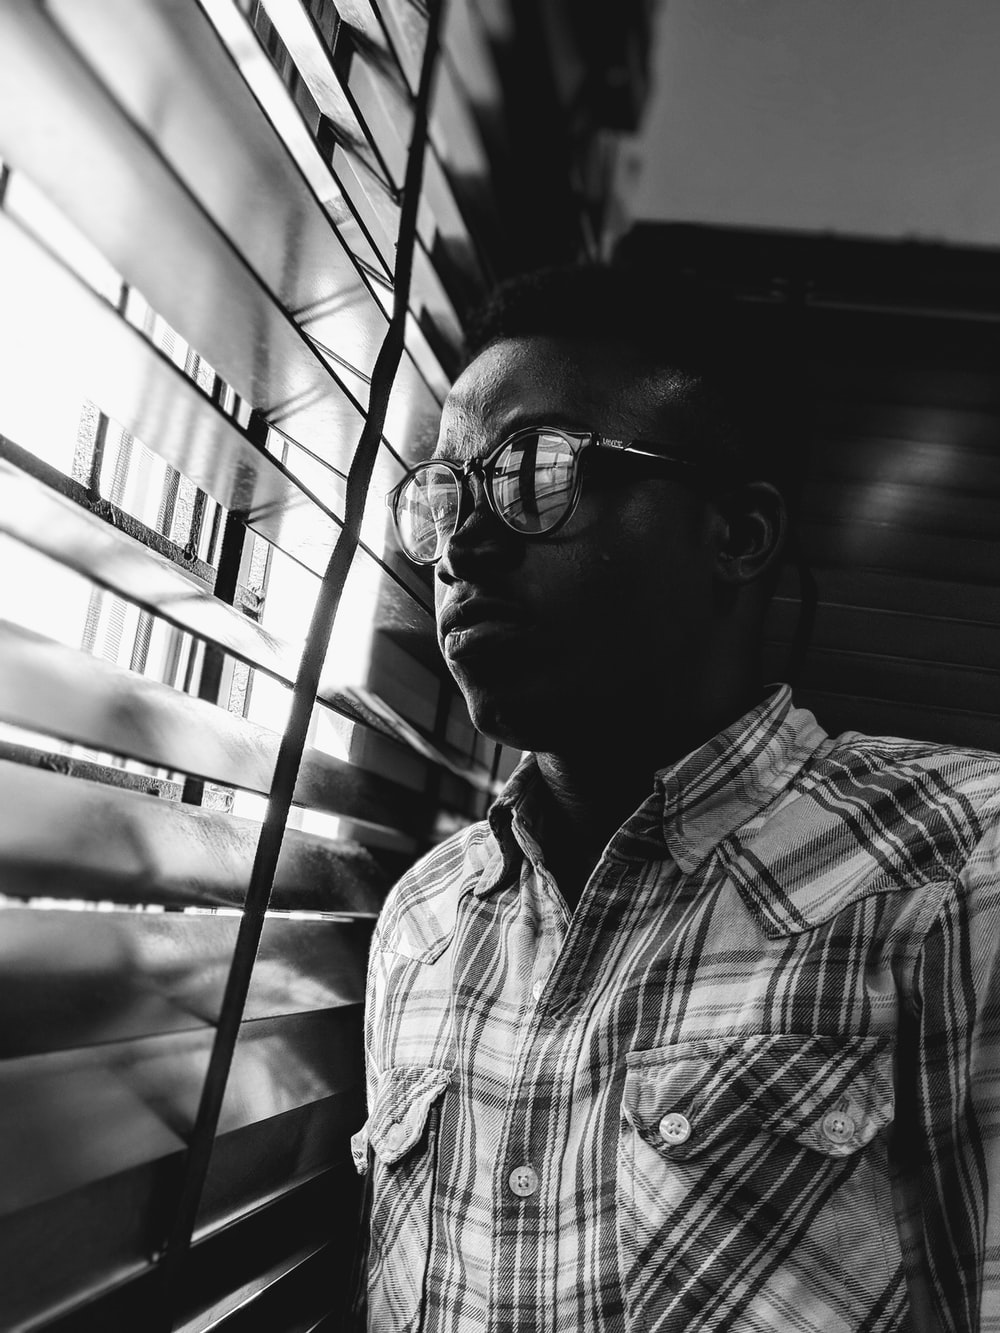 grayscale photo of man near window